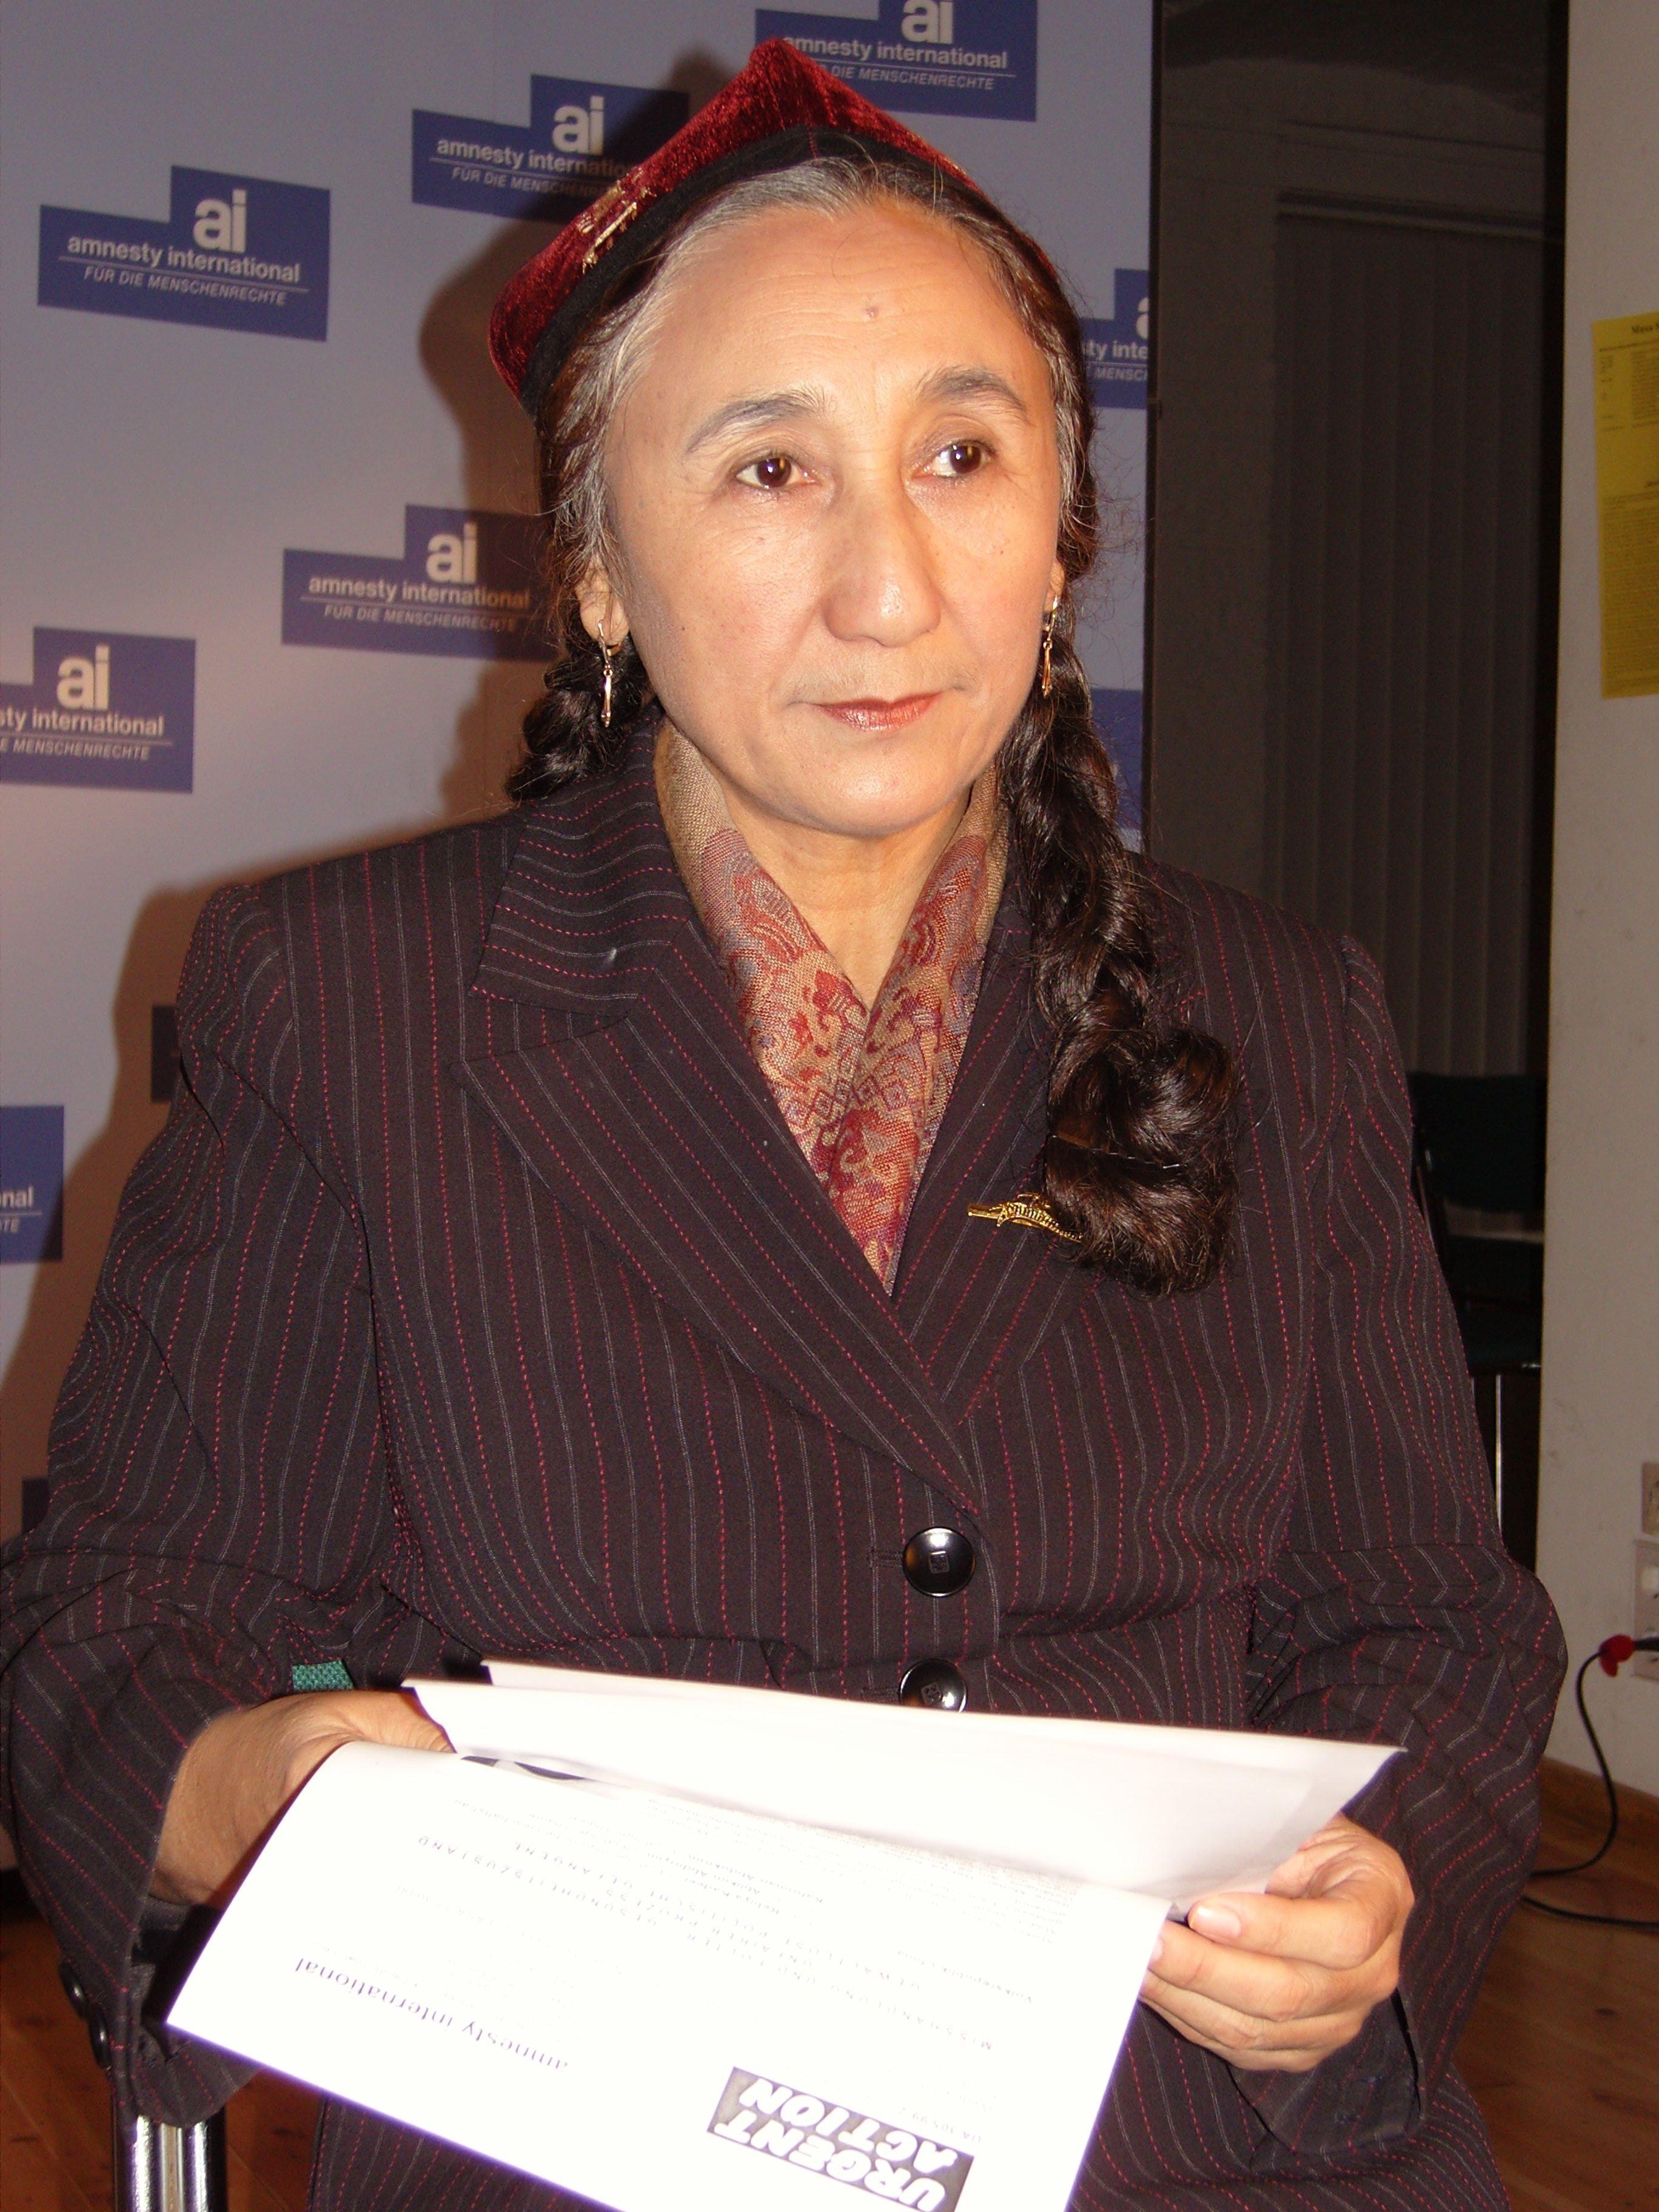 Kadeer foto2 copyright of the World Uyghur Congress